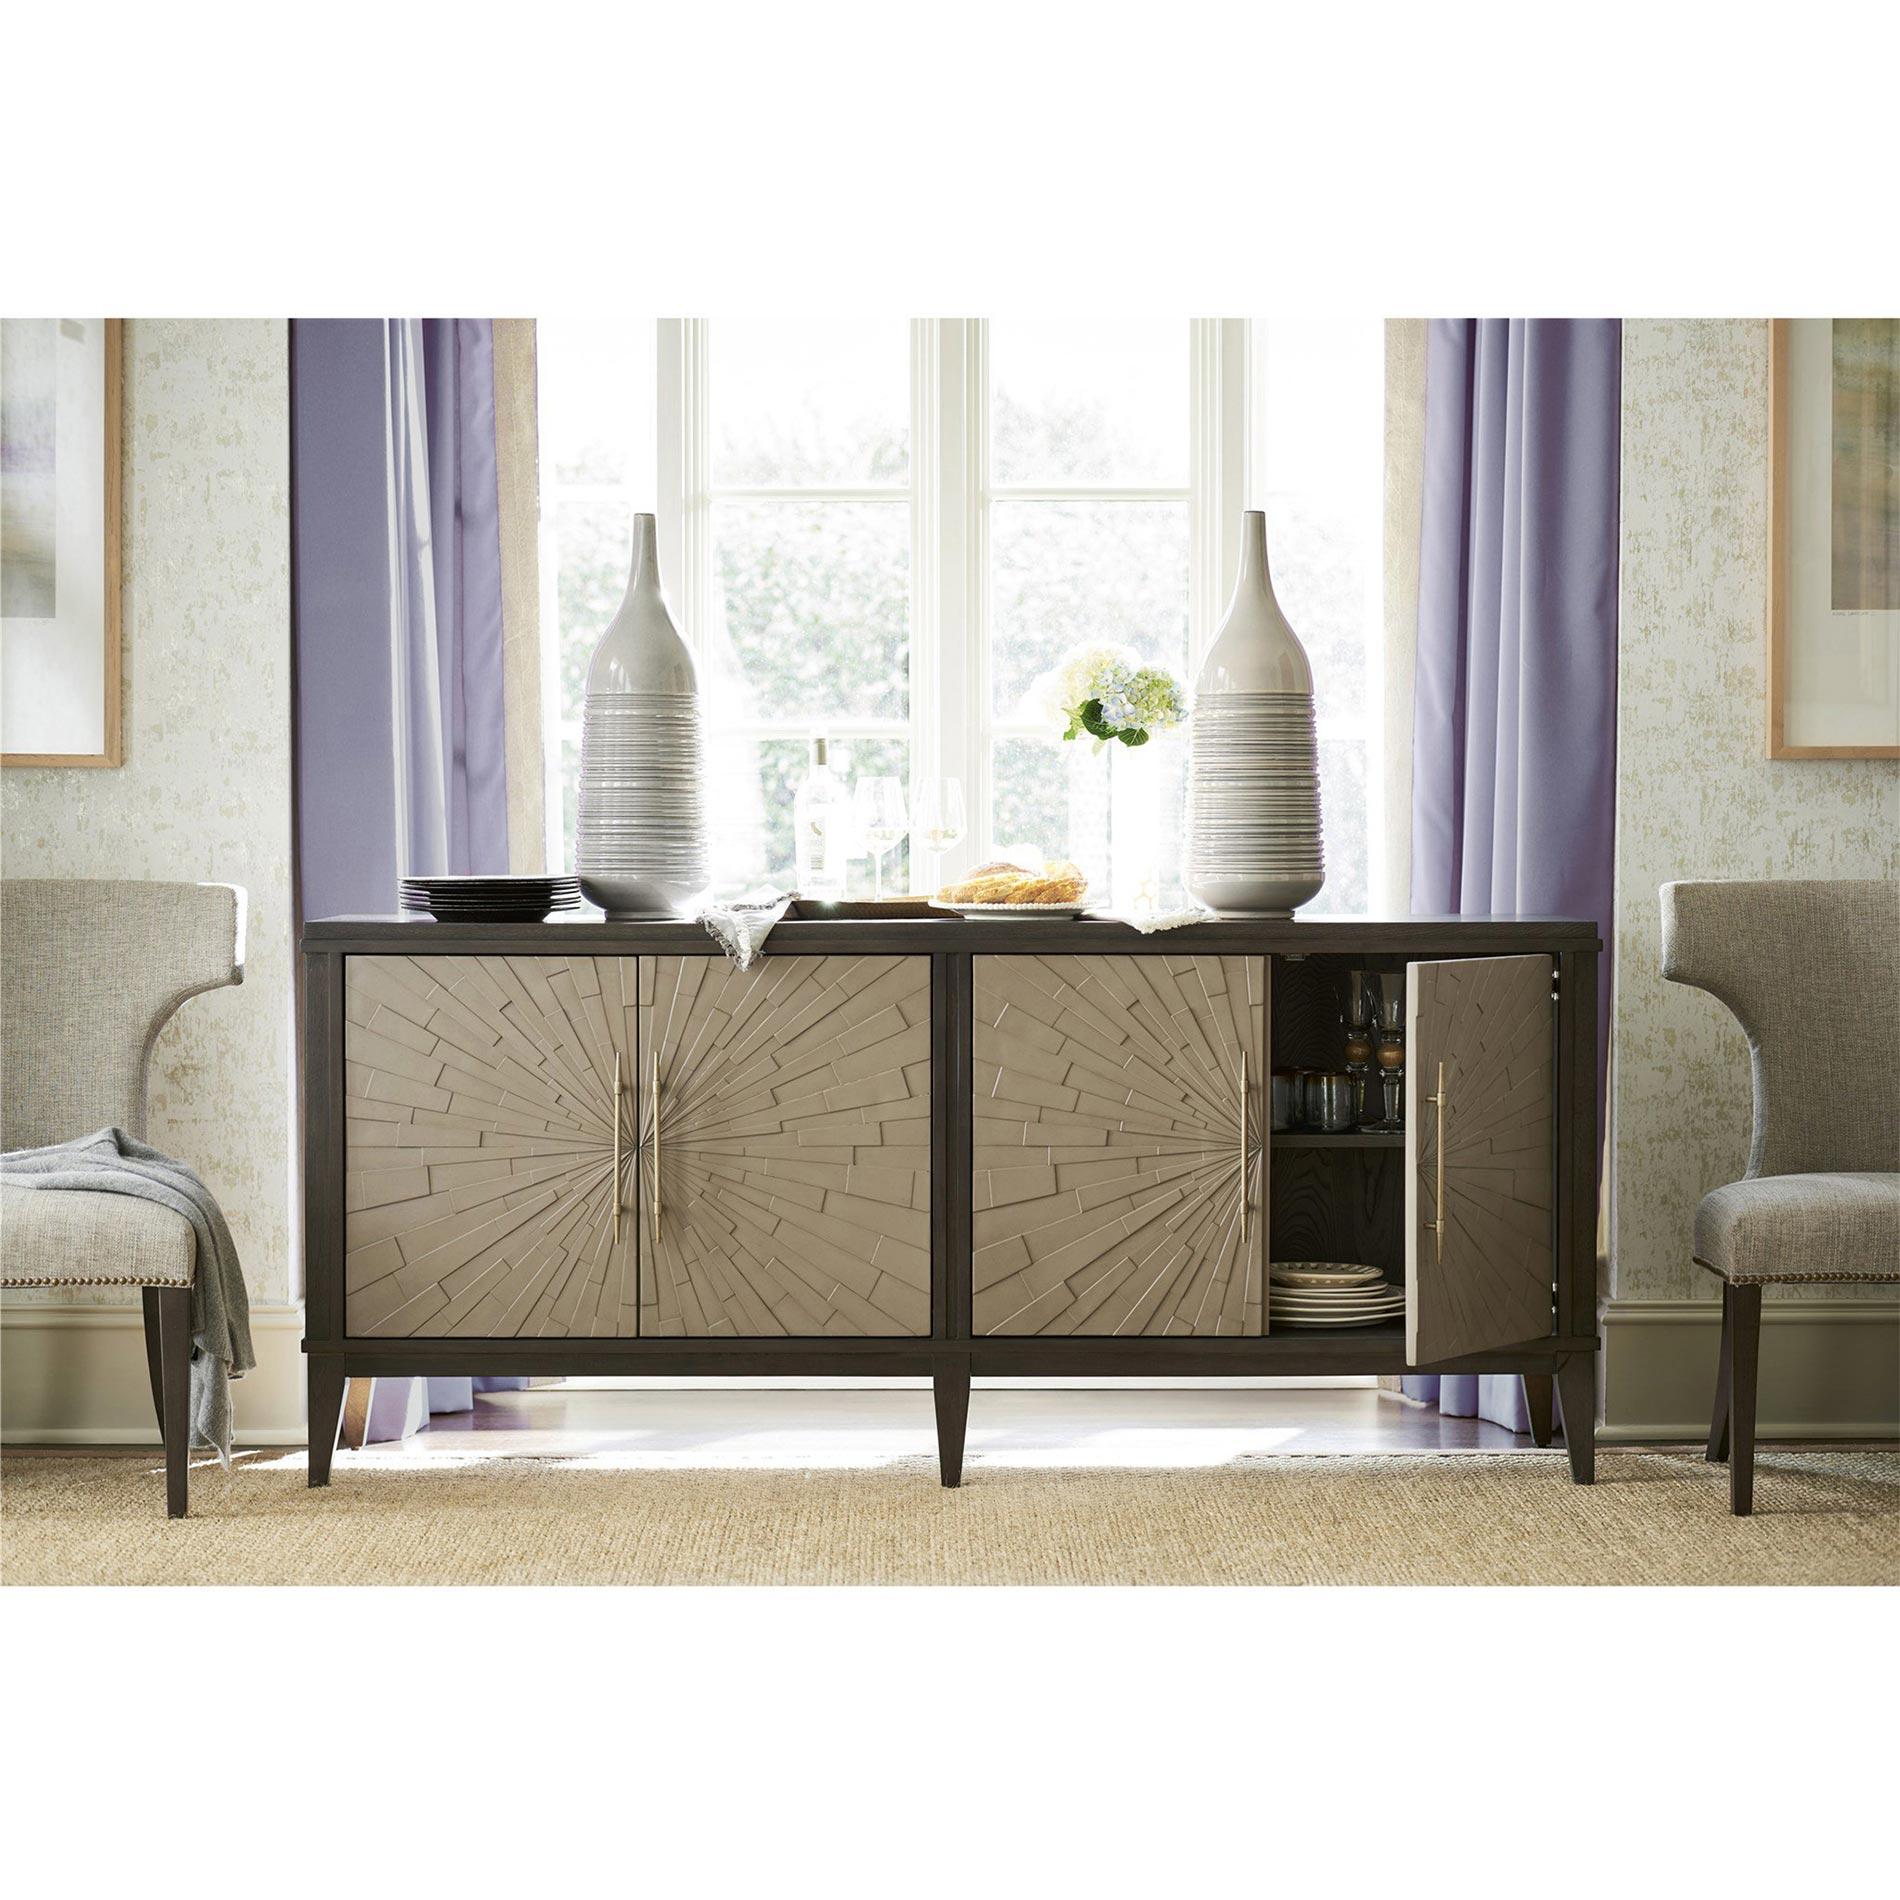 Zeya Mid Century Modern Starburst Gold Imprint Brown Wood Buffet Sideboard